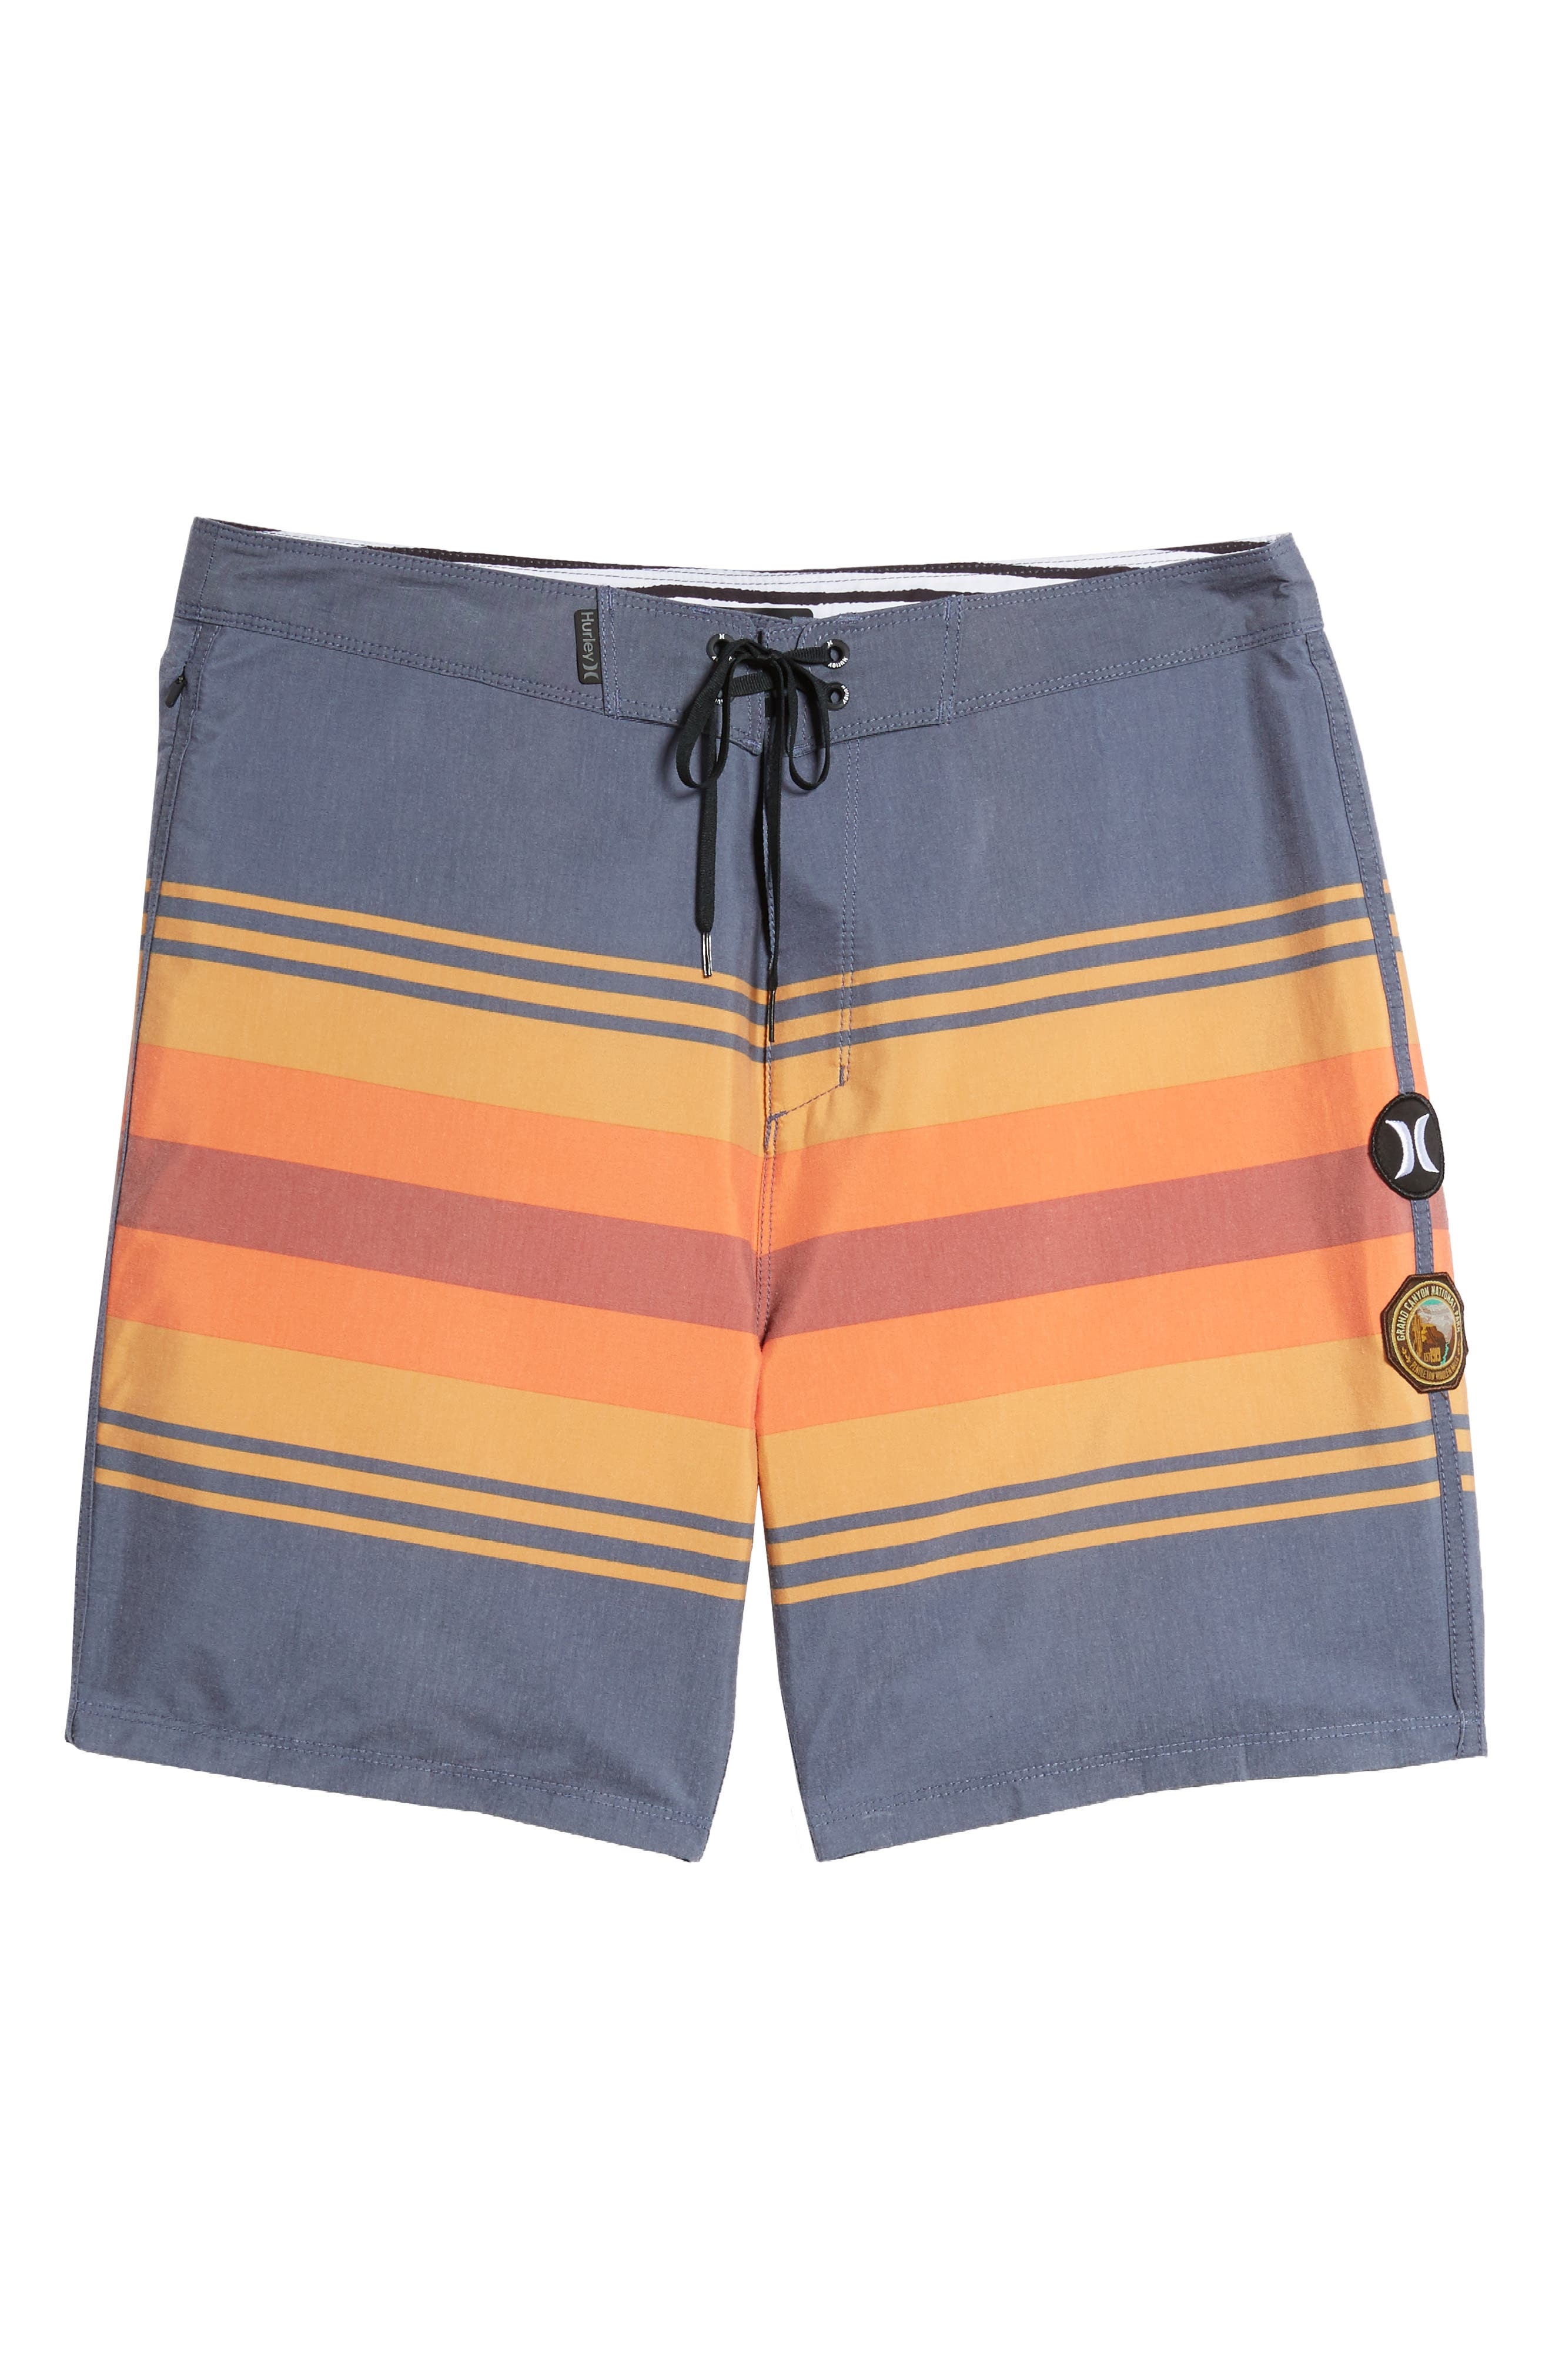 Pendleton Grand Canyon Beachside Board Shorts,                             Alternate thumbnail 6, color,